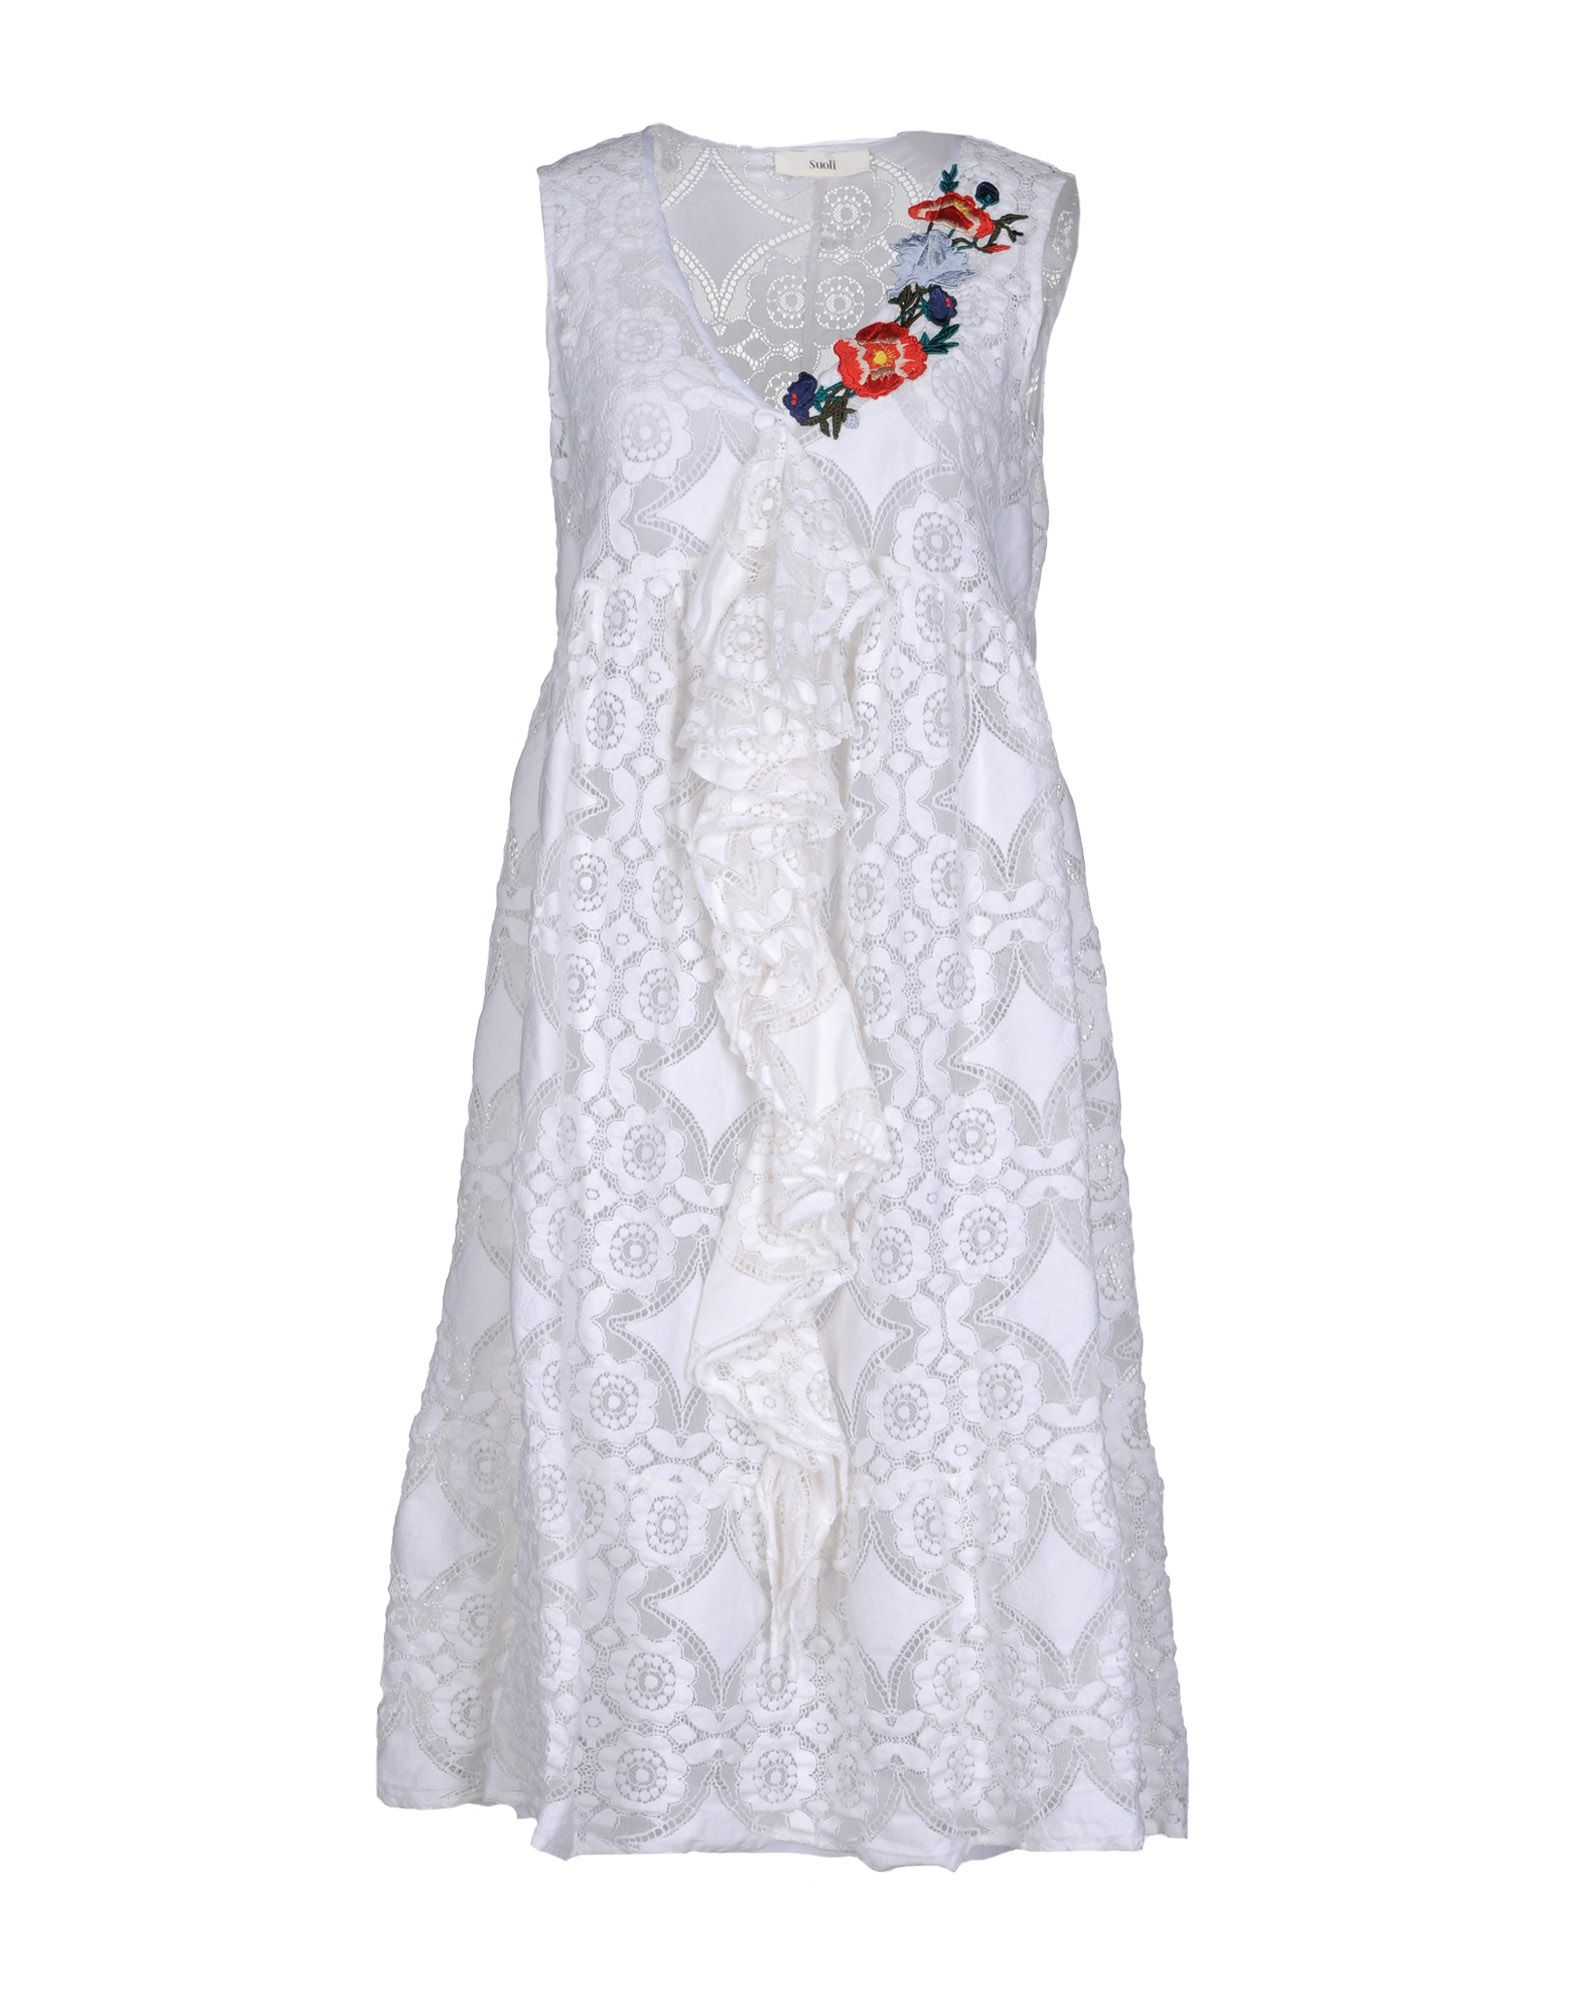 SUOLI Платье длиной 3/4 lisa corti платье длиной 3 4